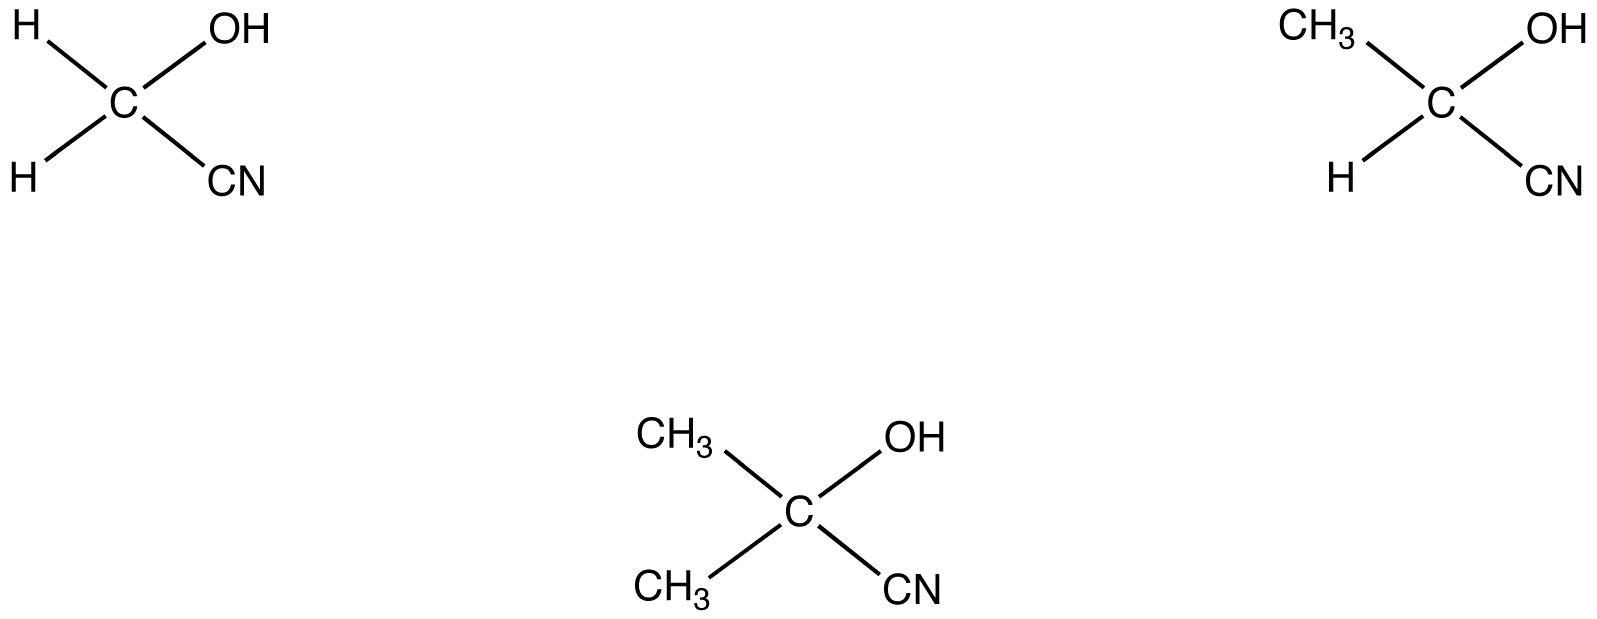 Cyanohydrin Ochempal